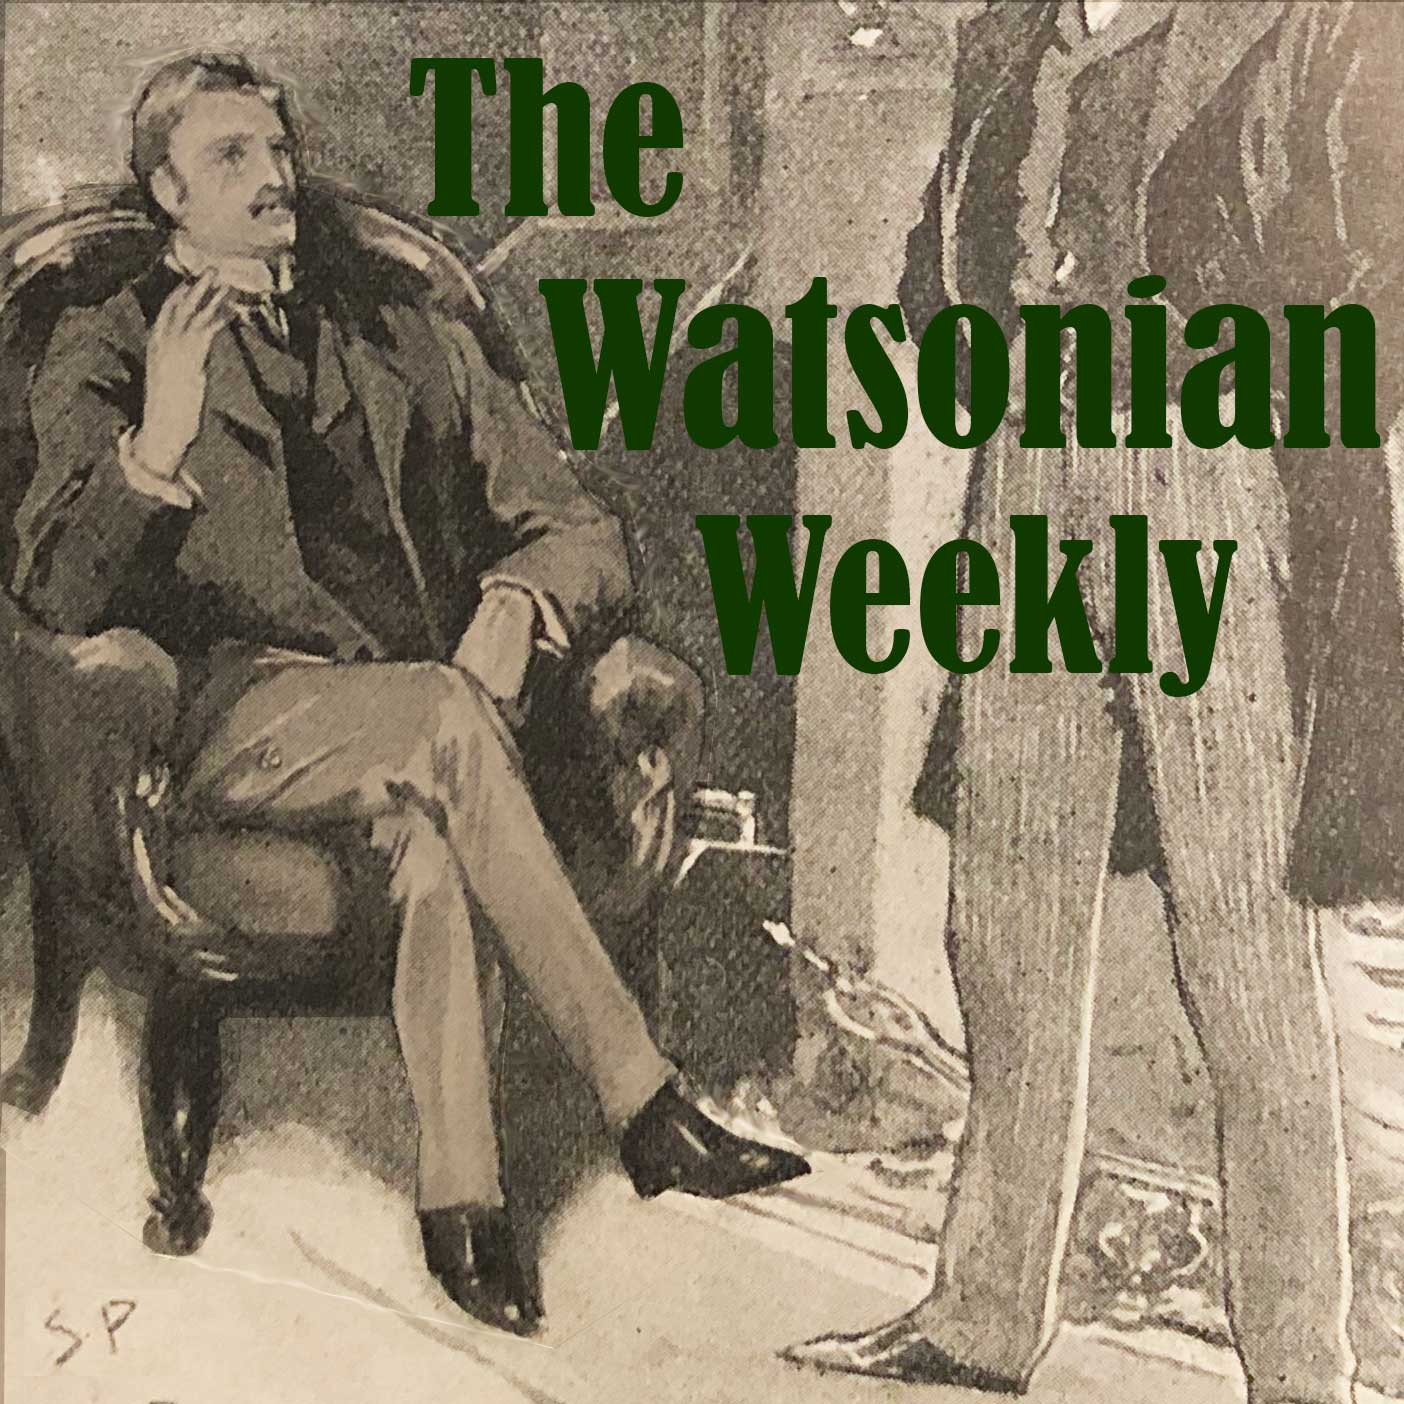 The Watsonian Weekly show art